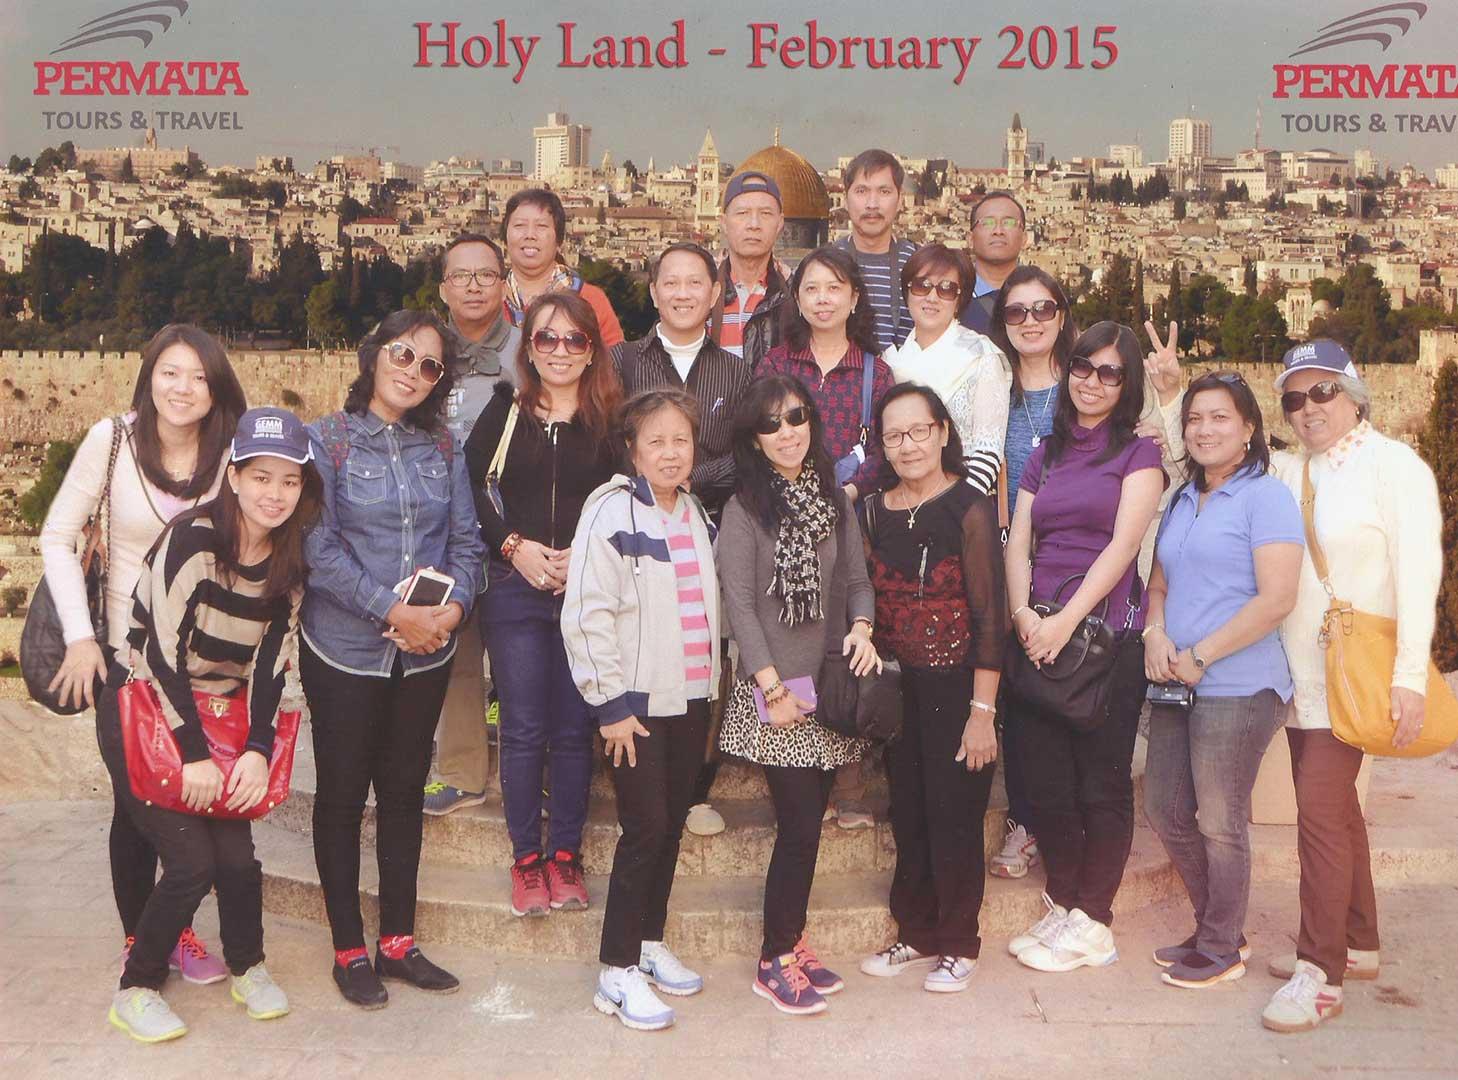 holyland permata tour